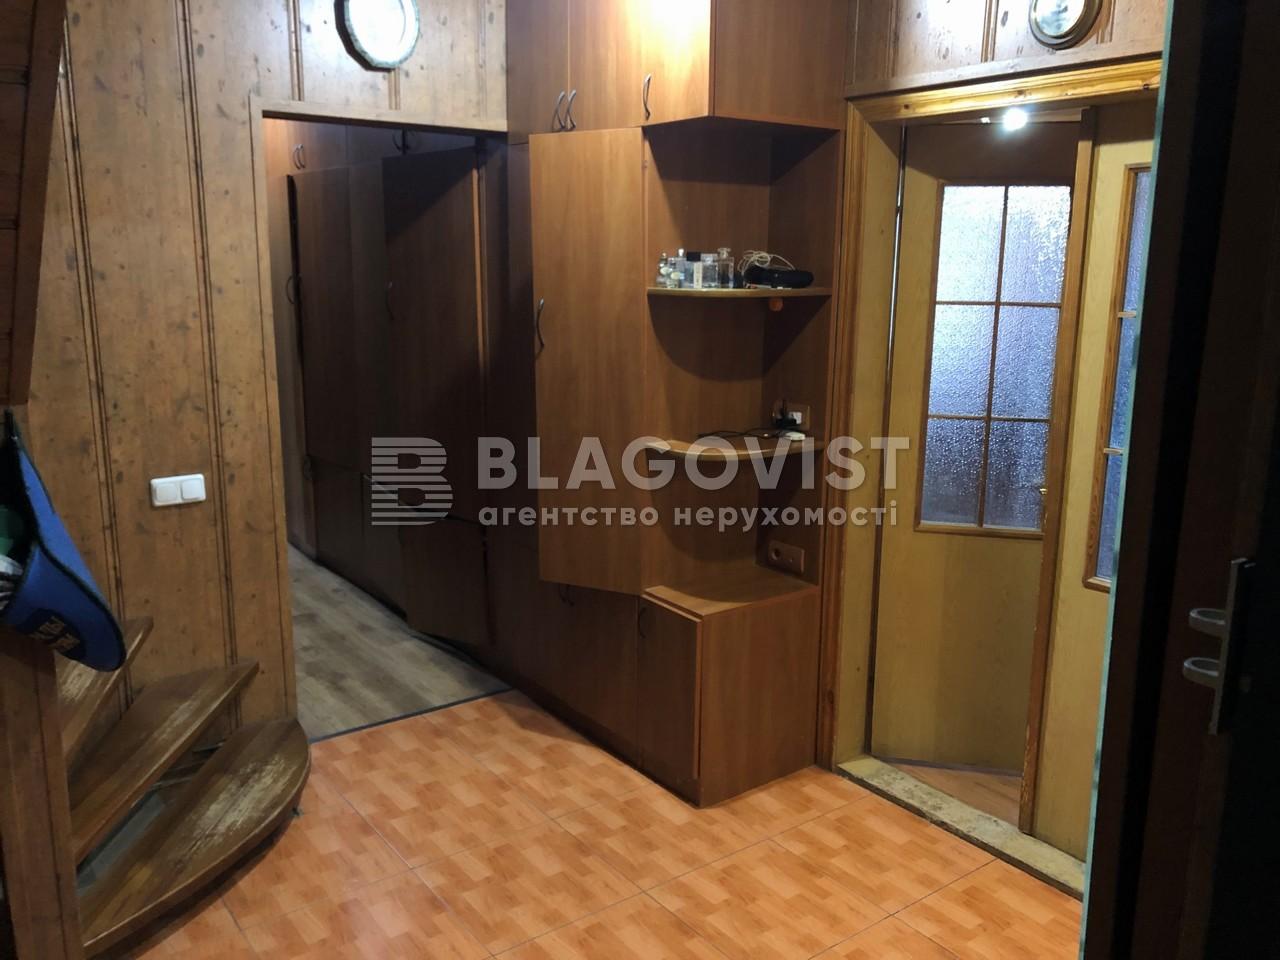 Квартира C-109398, Харьковское шоссе, 56, Киев - Фото 21